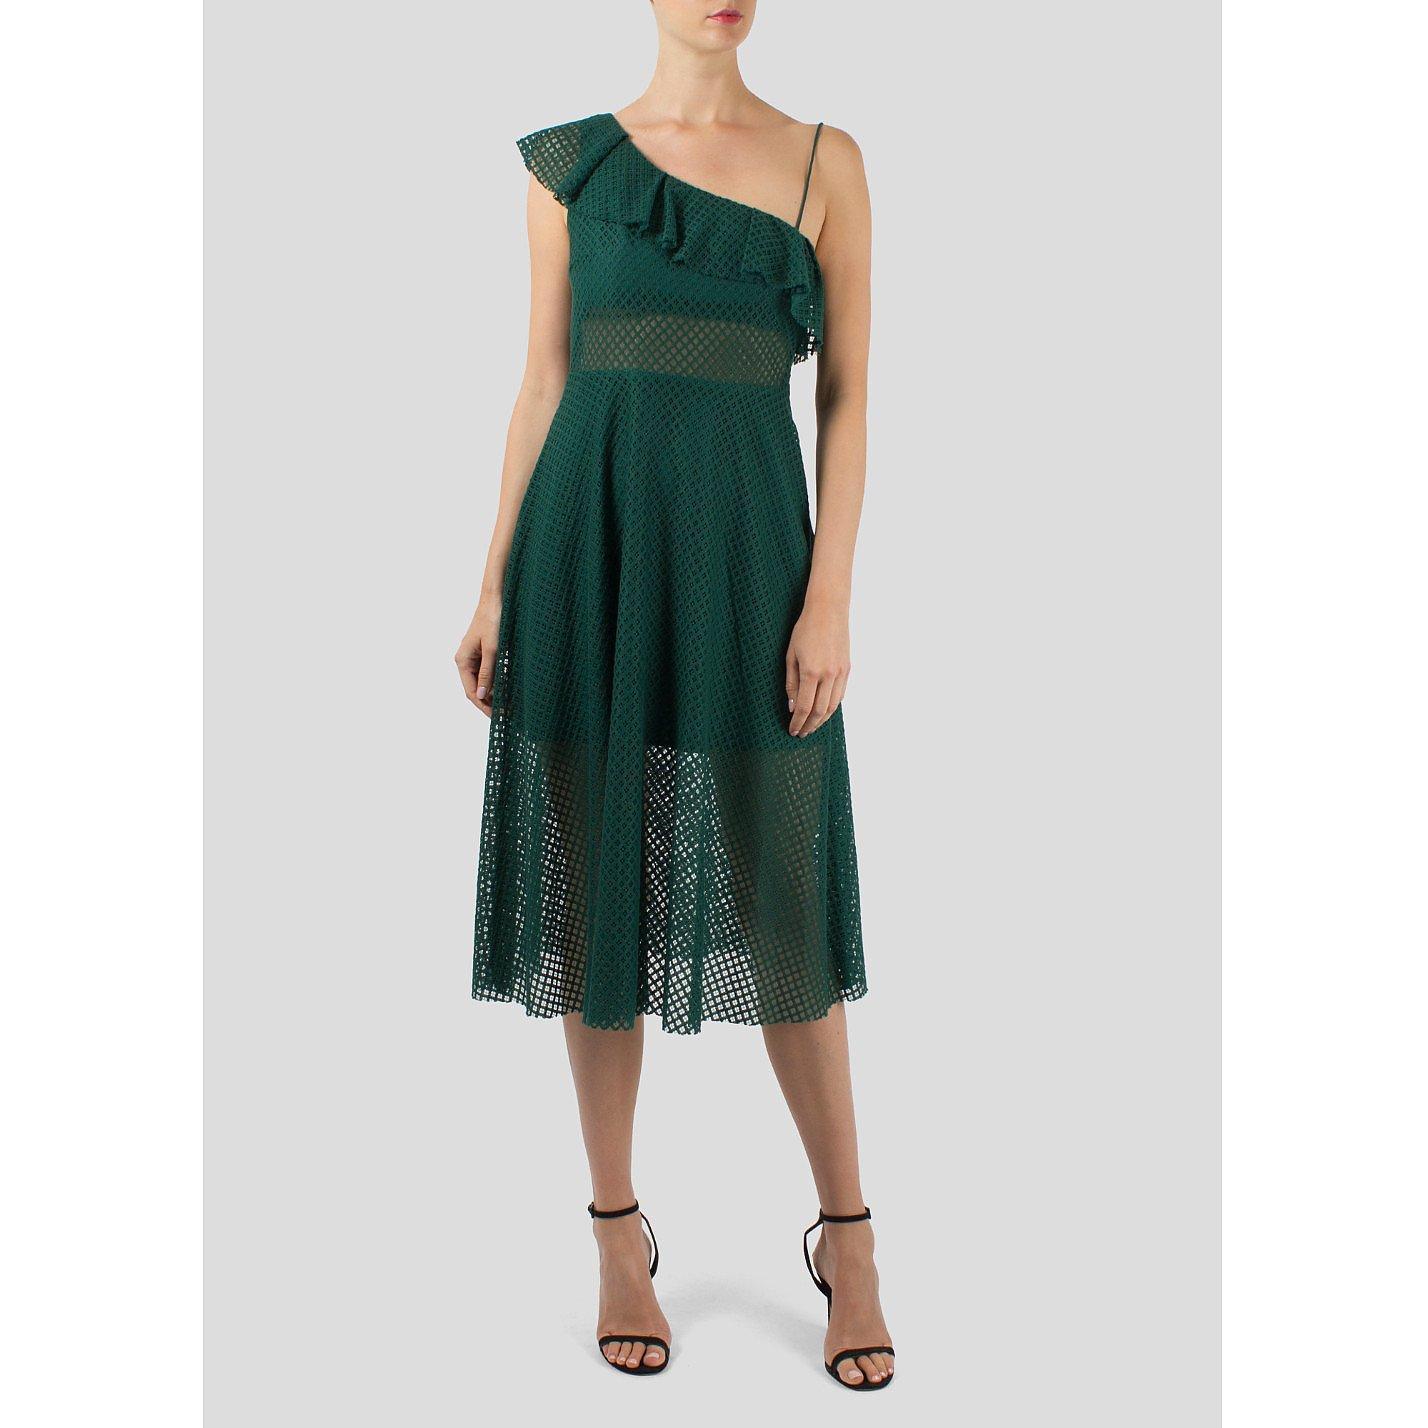 Sandro Ruffle Shoulder Dress